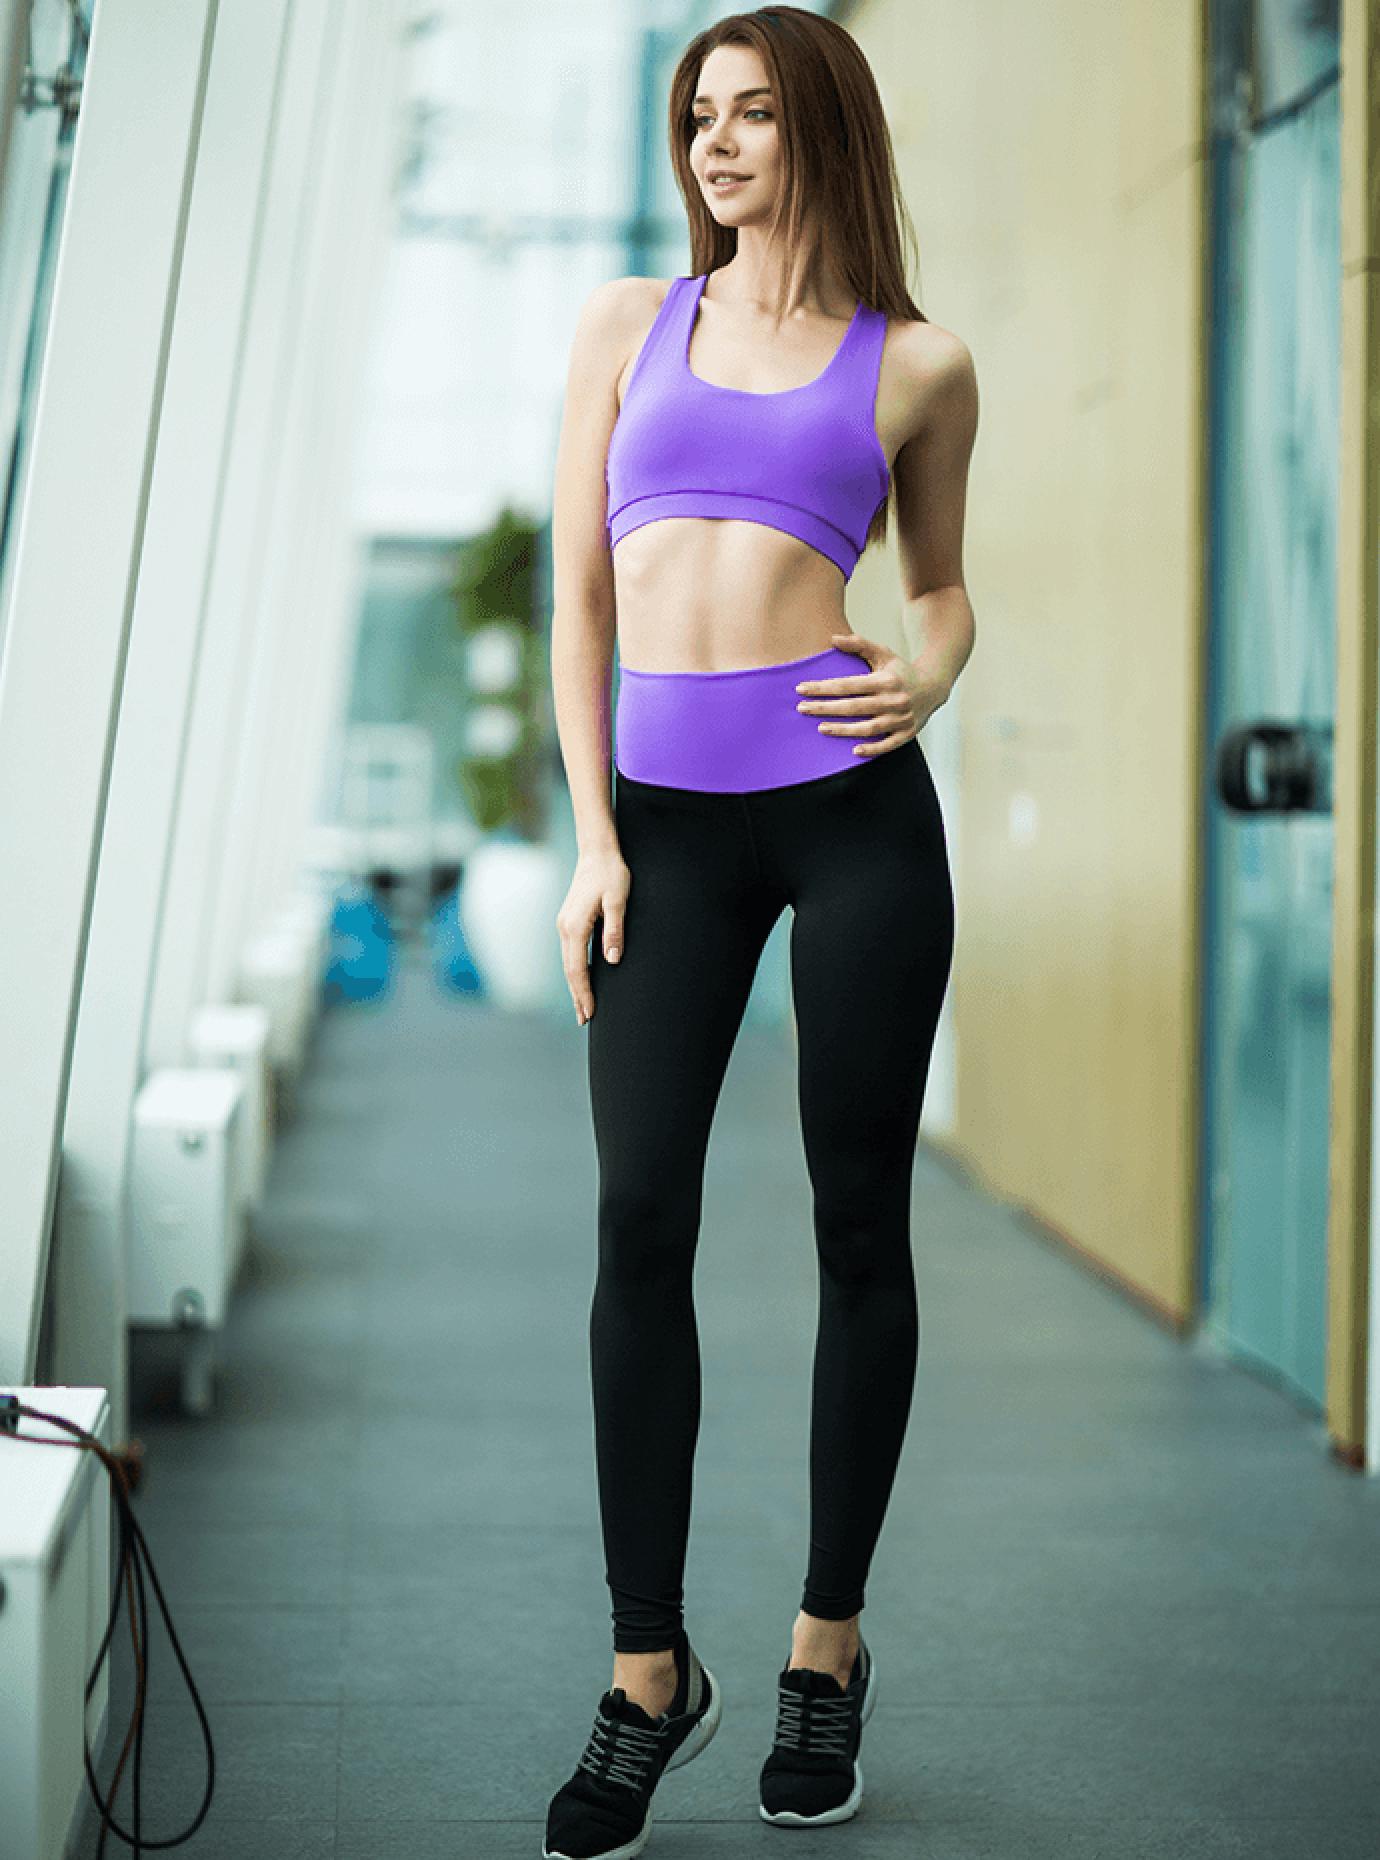 Комплект женский High Waist Lavender Leggings Серый S (01-F171126): фото - Alster.ua